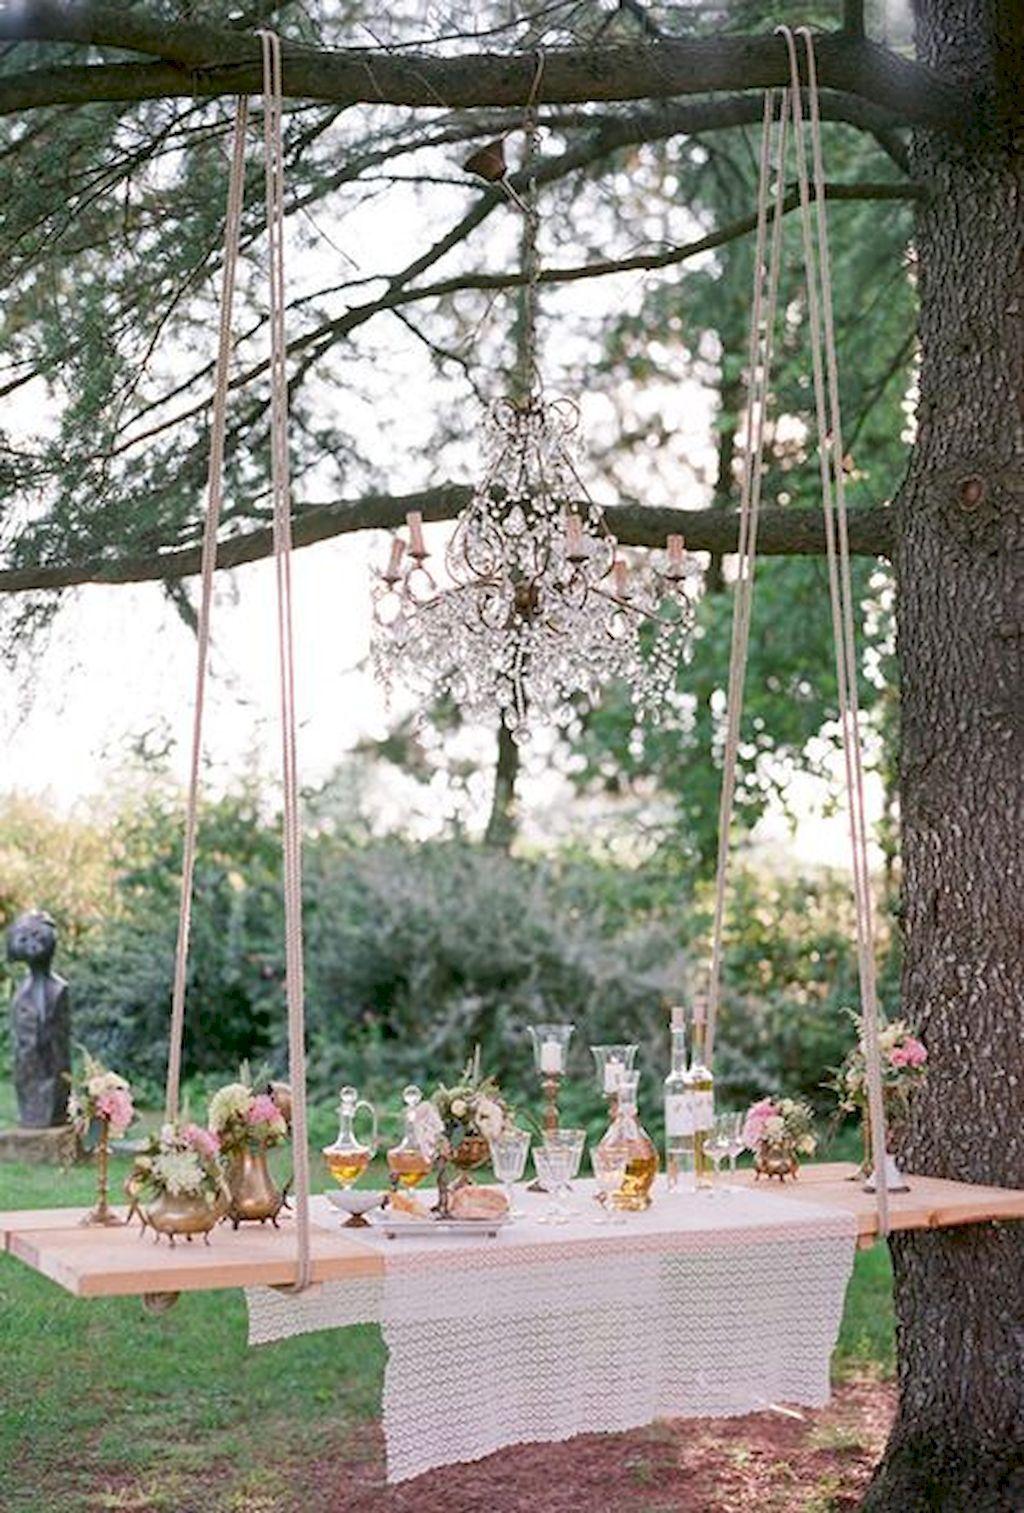 Diy outside wedding decorations  Pin by Wedding Ideas Ant Tips on Backyard Wedding  Pinterest